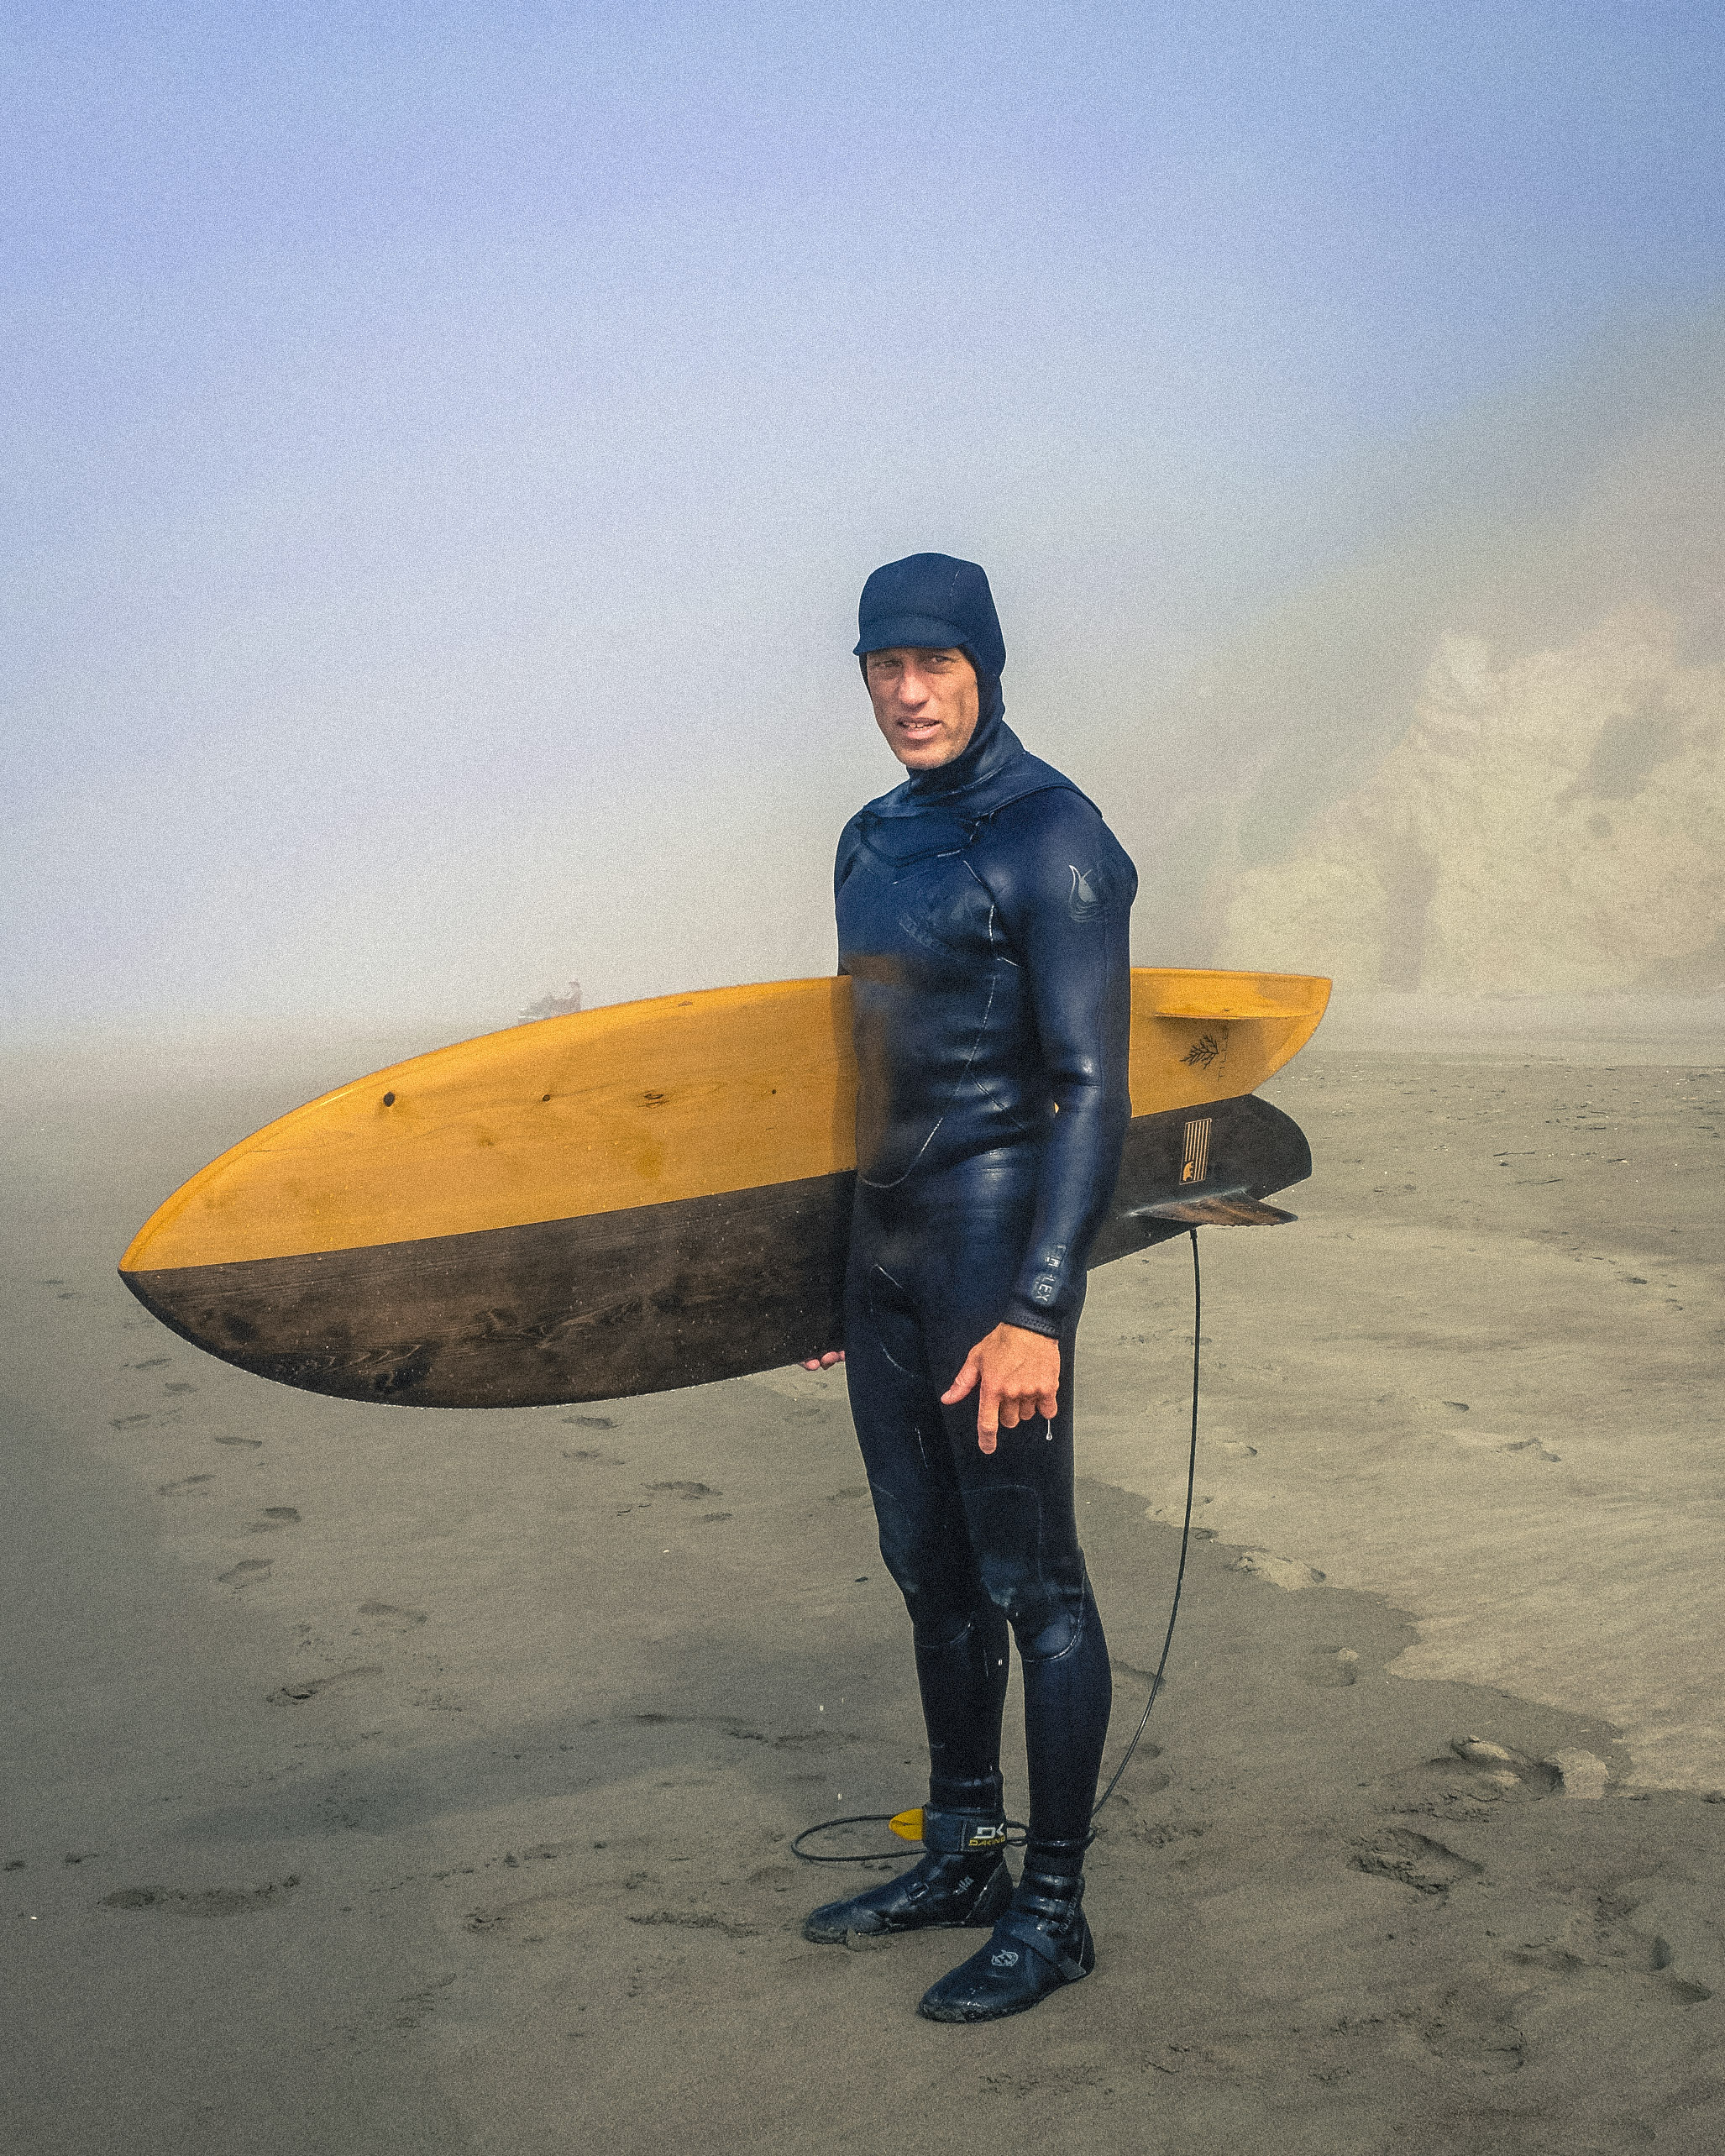 Black-Bear-Brand-Tilley-Surfboards-Water-Testing-04.jpg